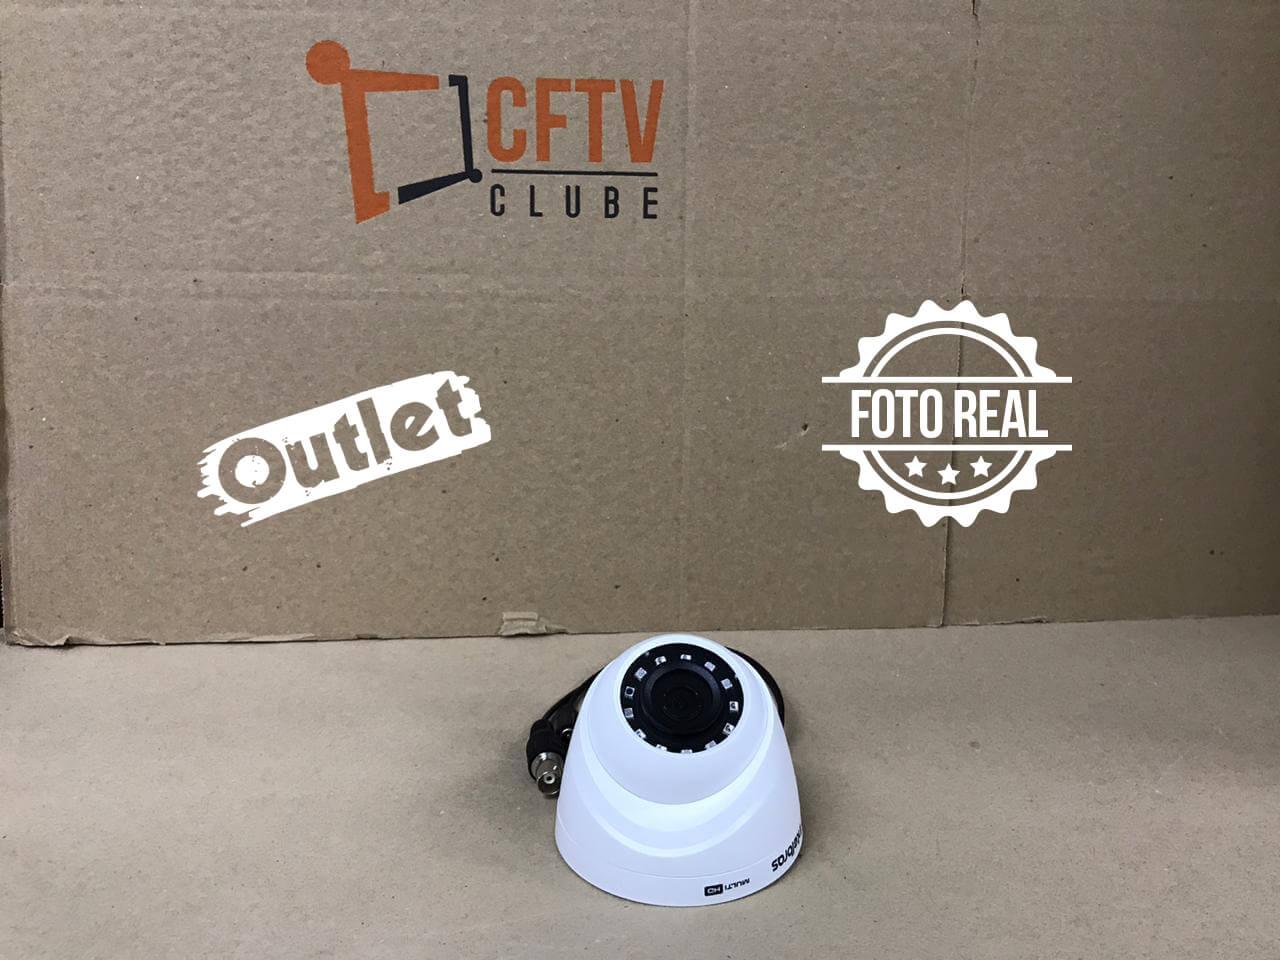 Outlet - Câmera Intelbras Dome Multi HD 1120 D (1.0MP | 720p | Plast)  - CFTV Clube | Brasil